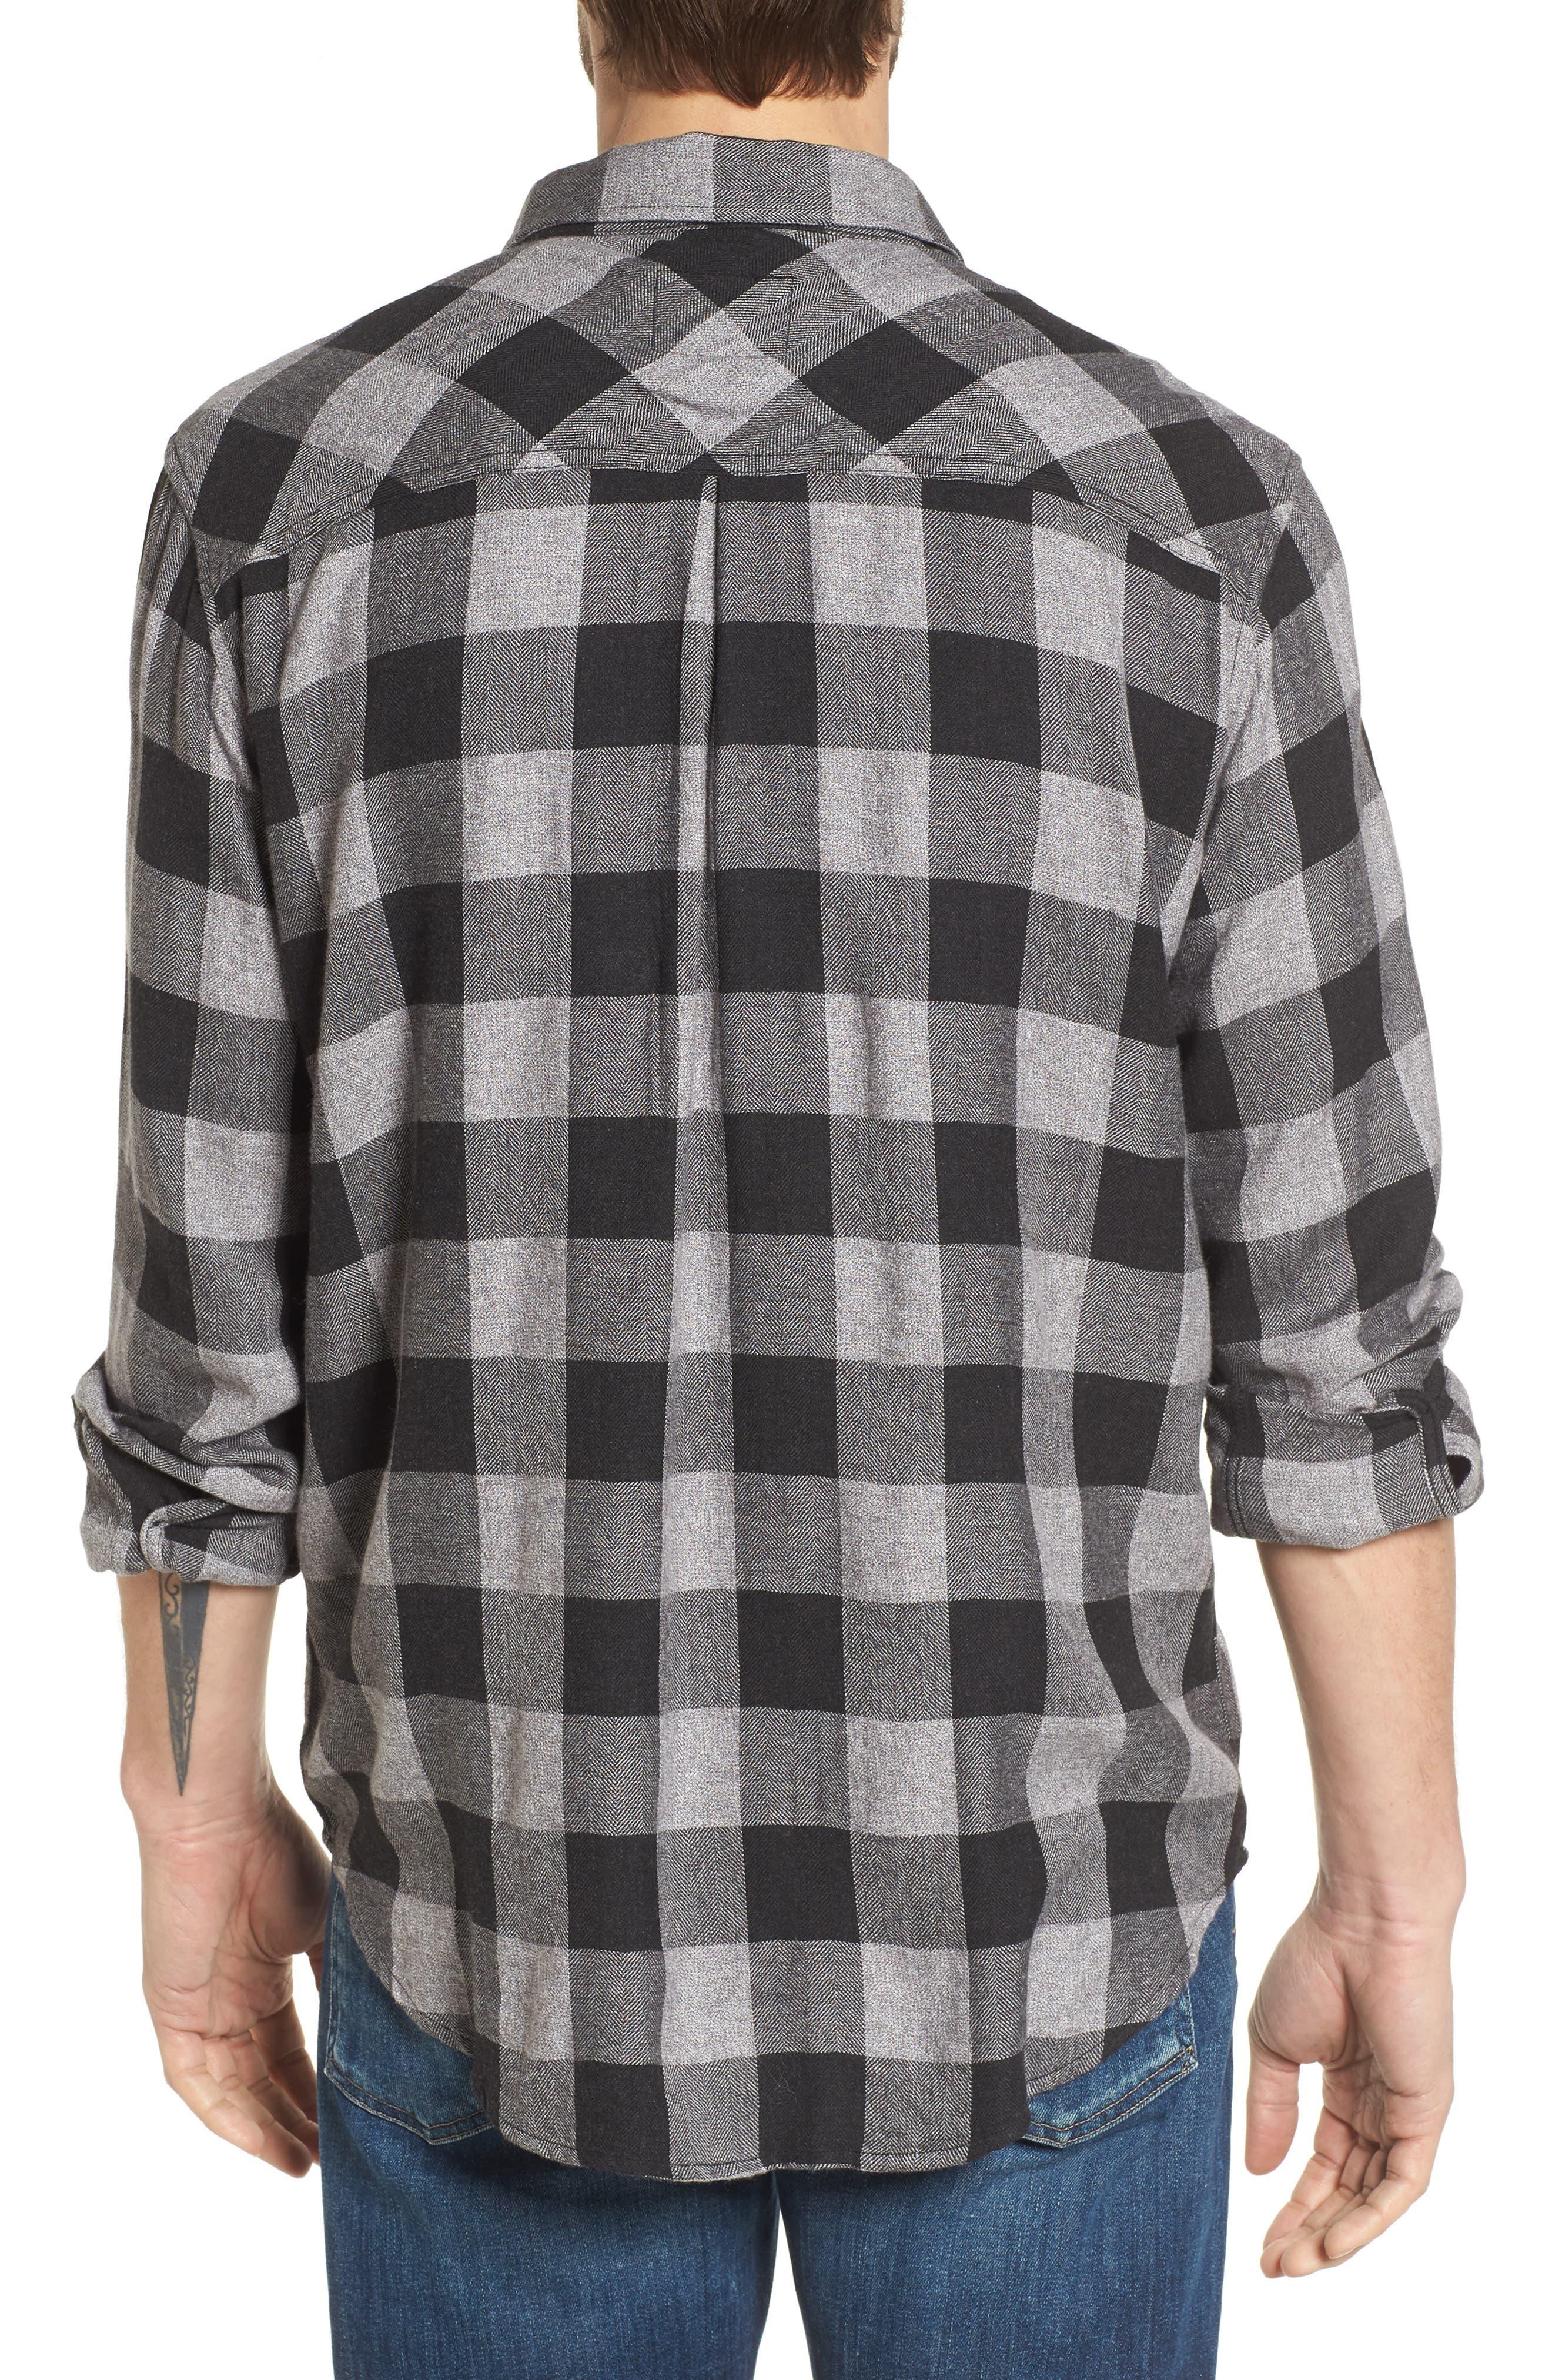 Lennox Sport Shirt,                             Alternate thumbnail 2, color,                             CHARCOAL/ BLACK CHECK